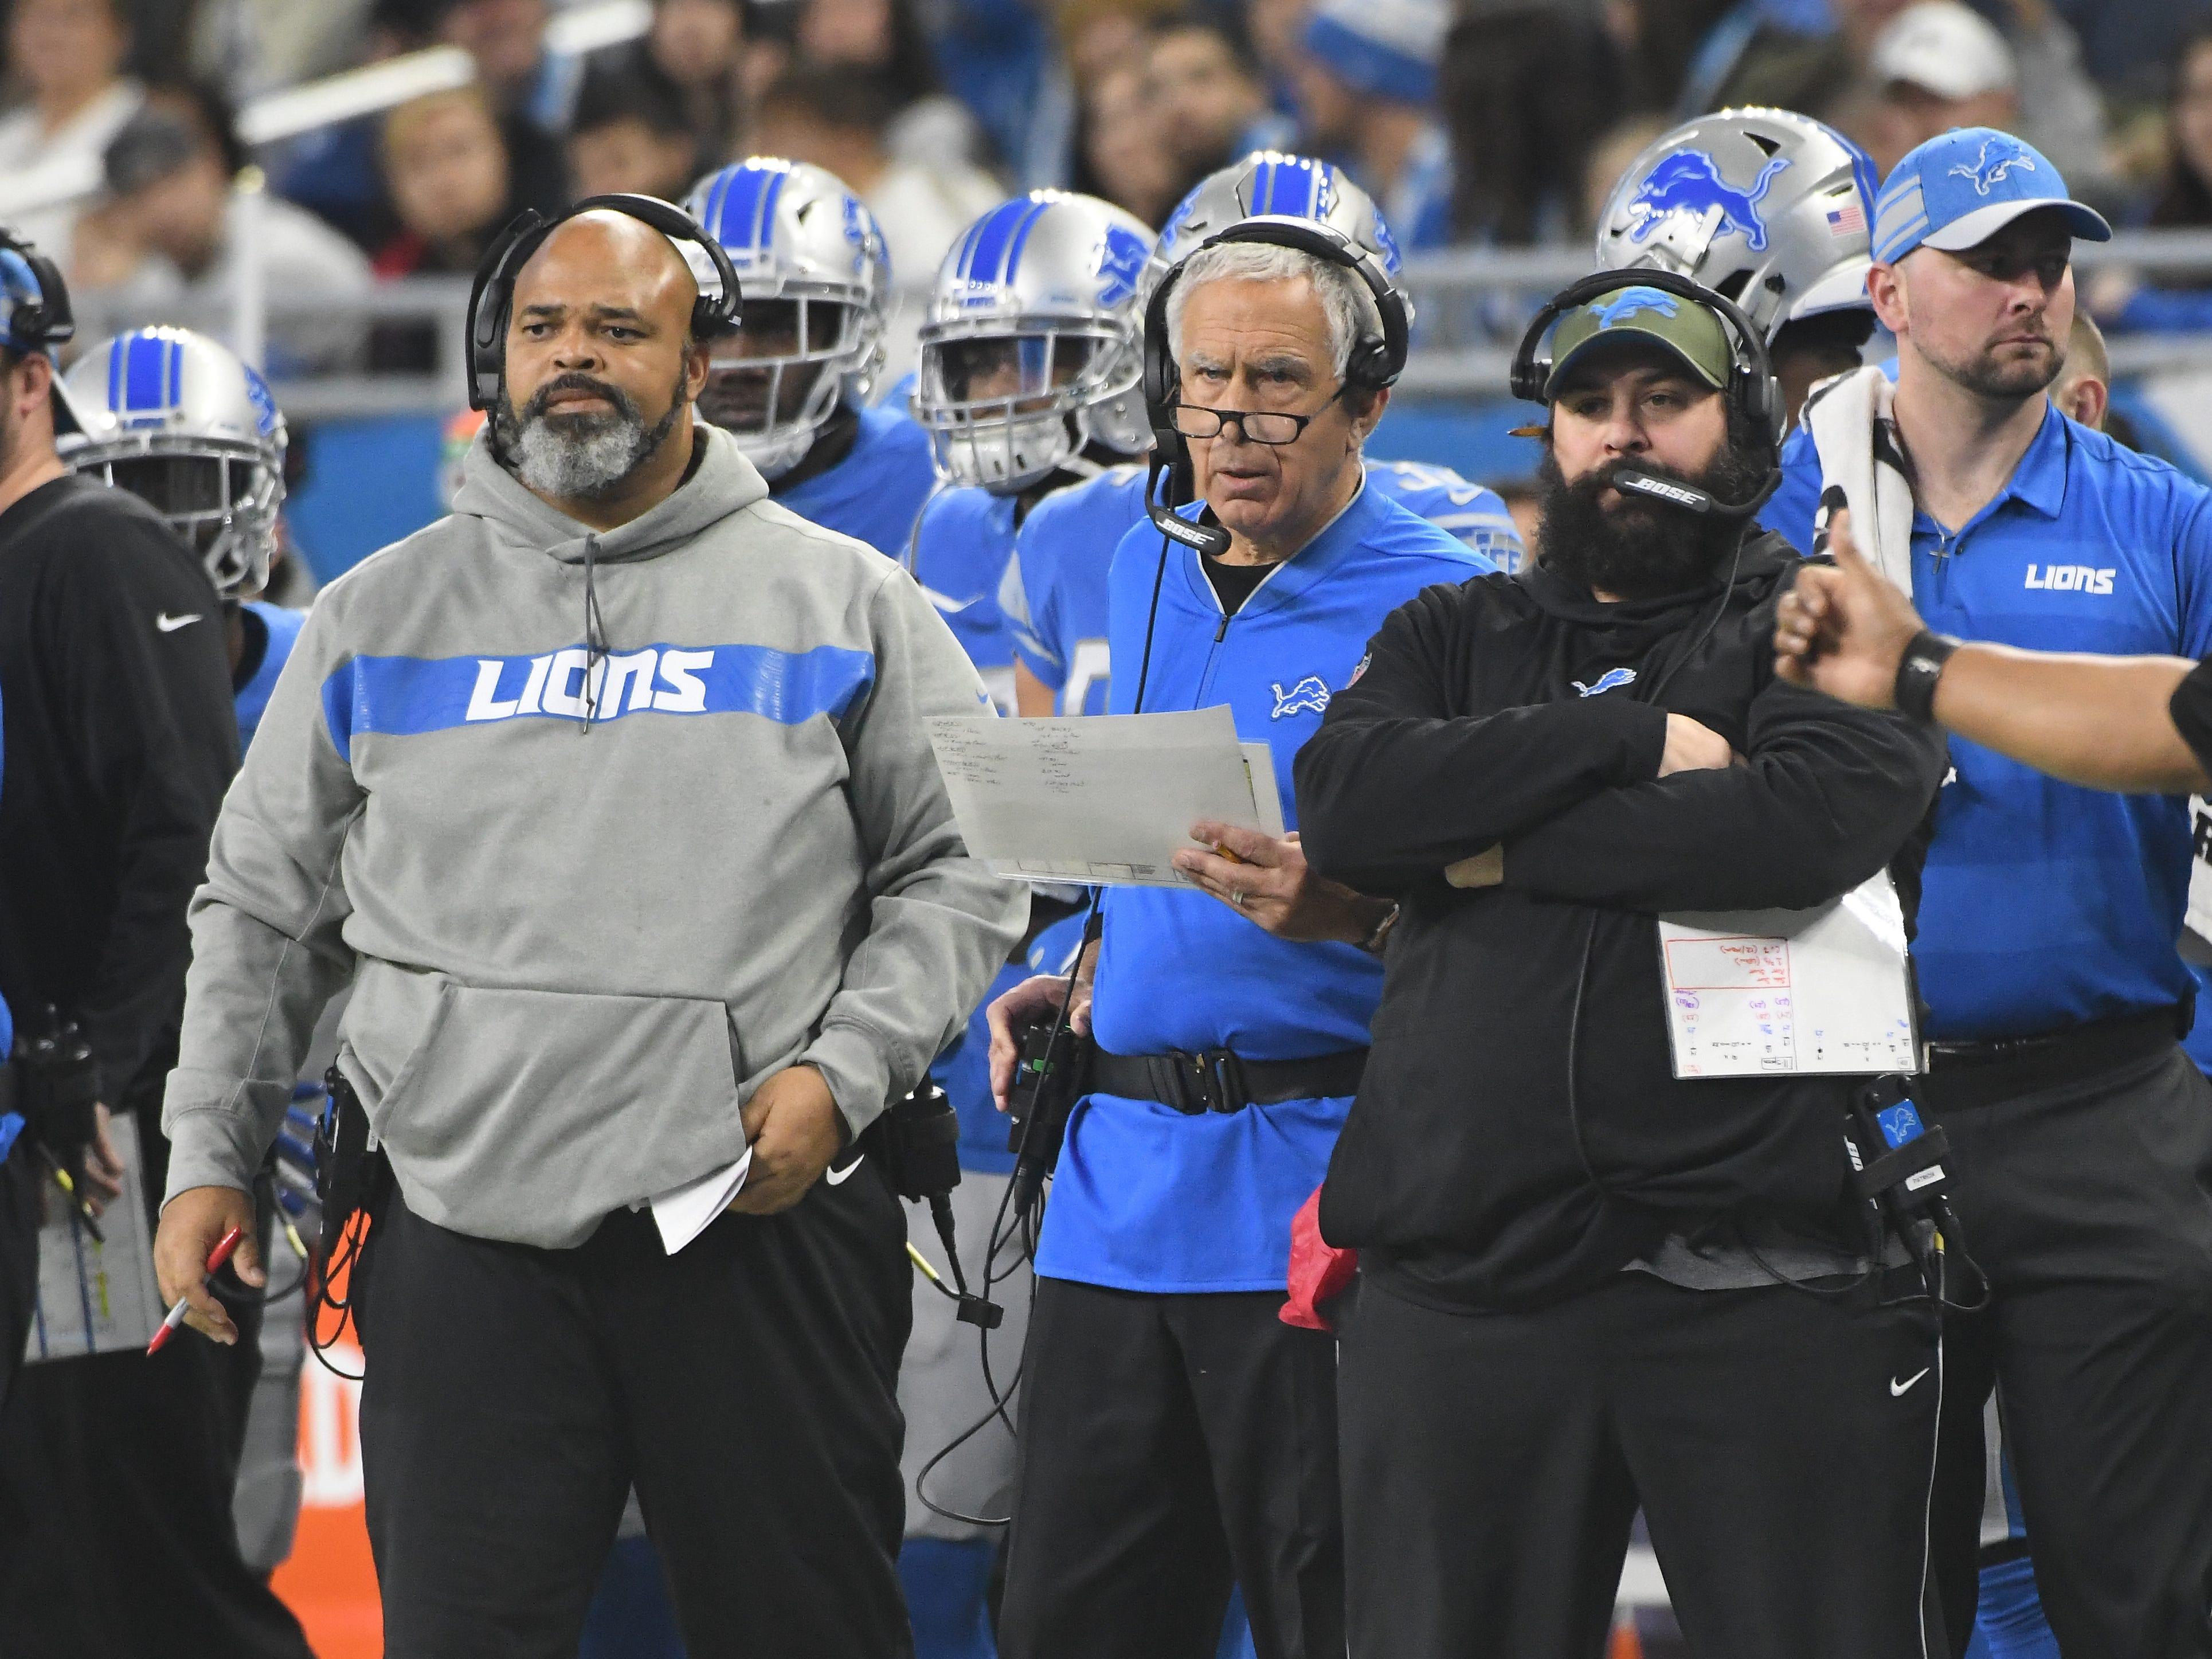 Lions defensive line coach Bo Davis, defensive coordinator Paul Pasqualoni and head coach Matt Patricia on the sidelines in the first quarter.